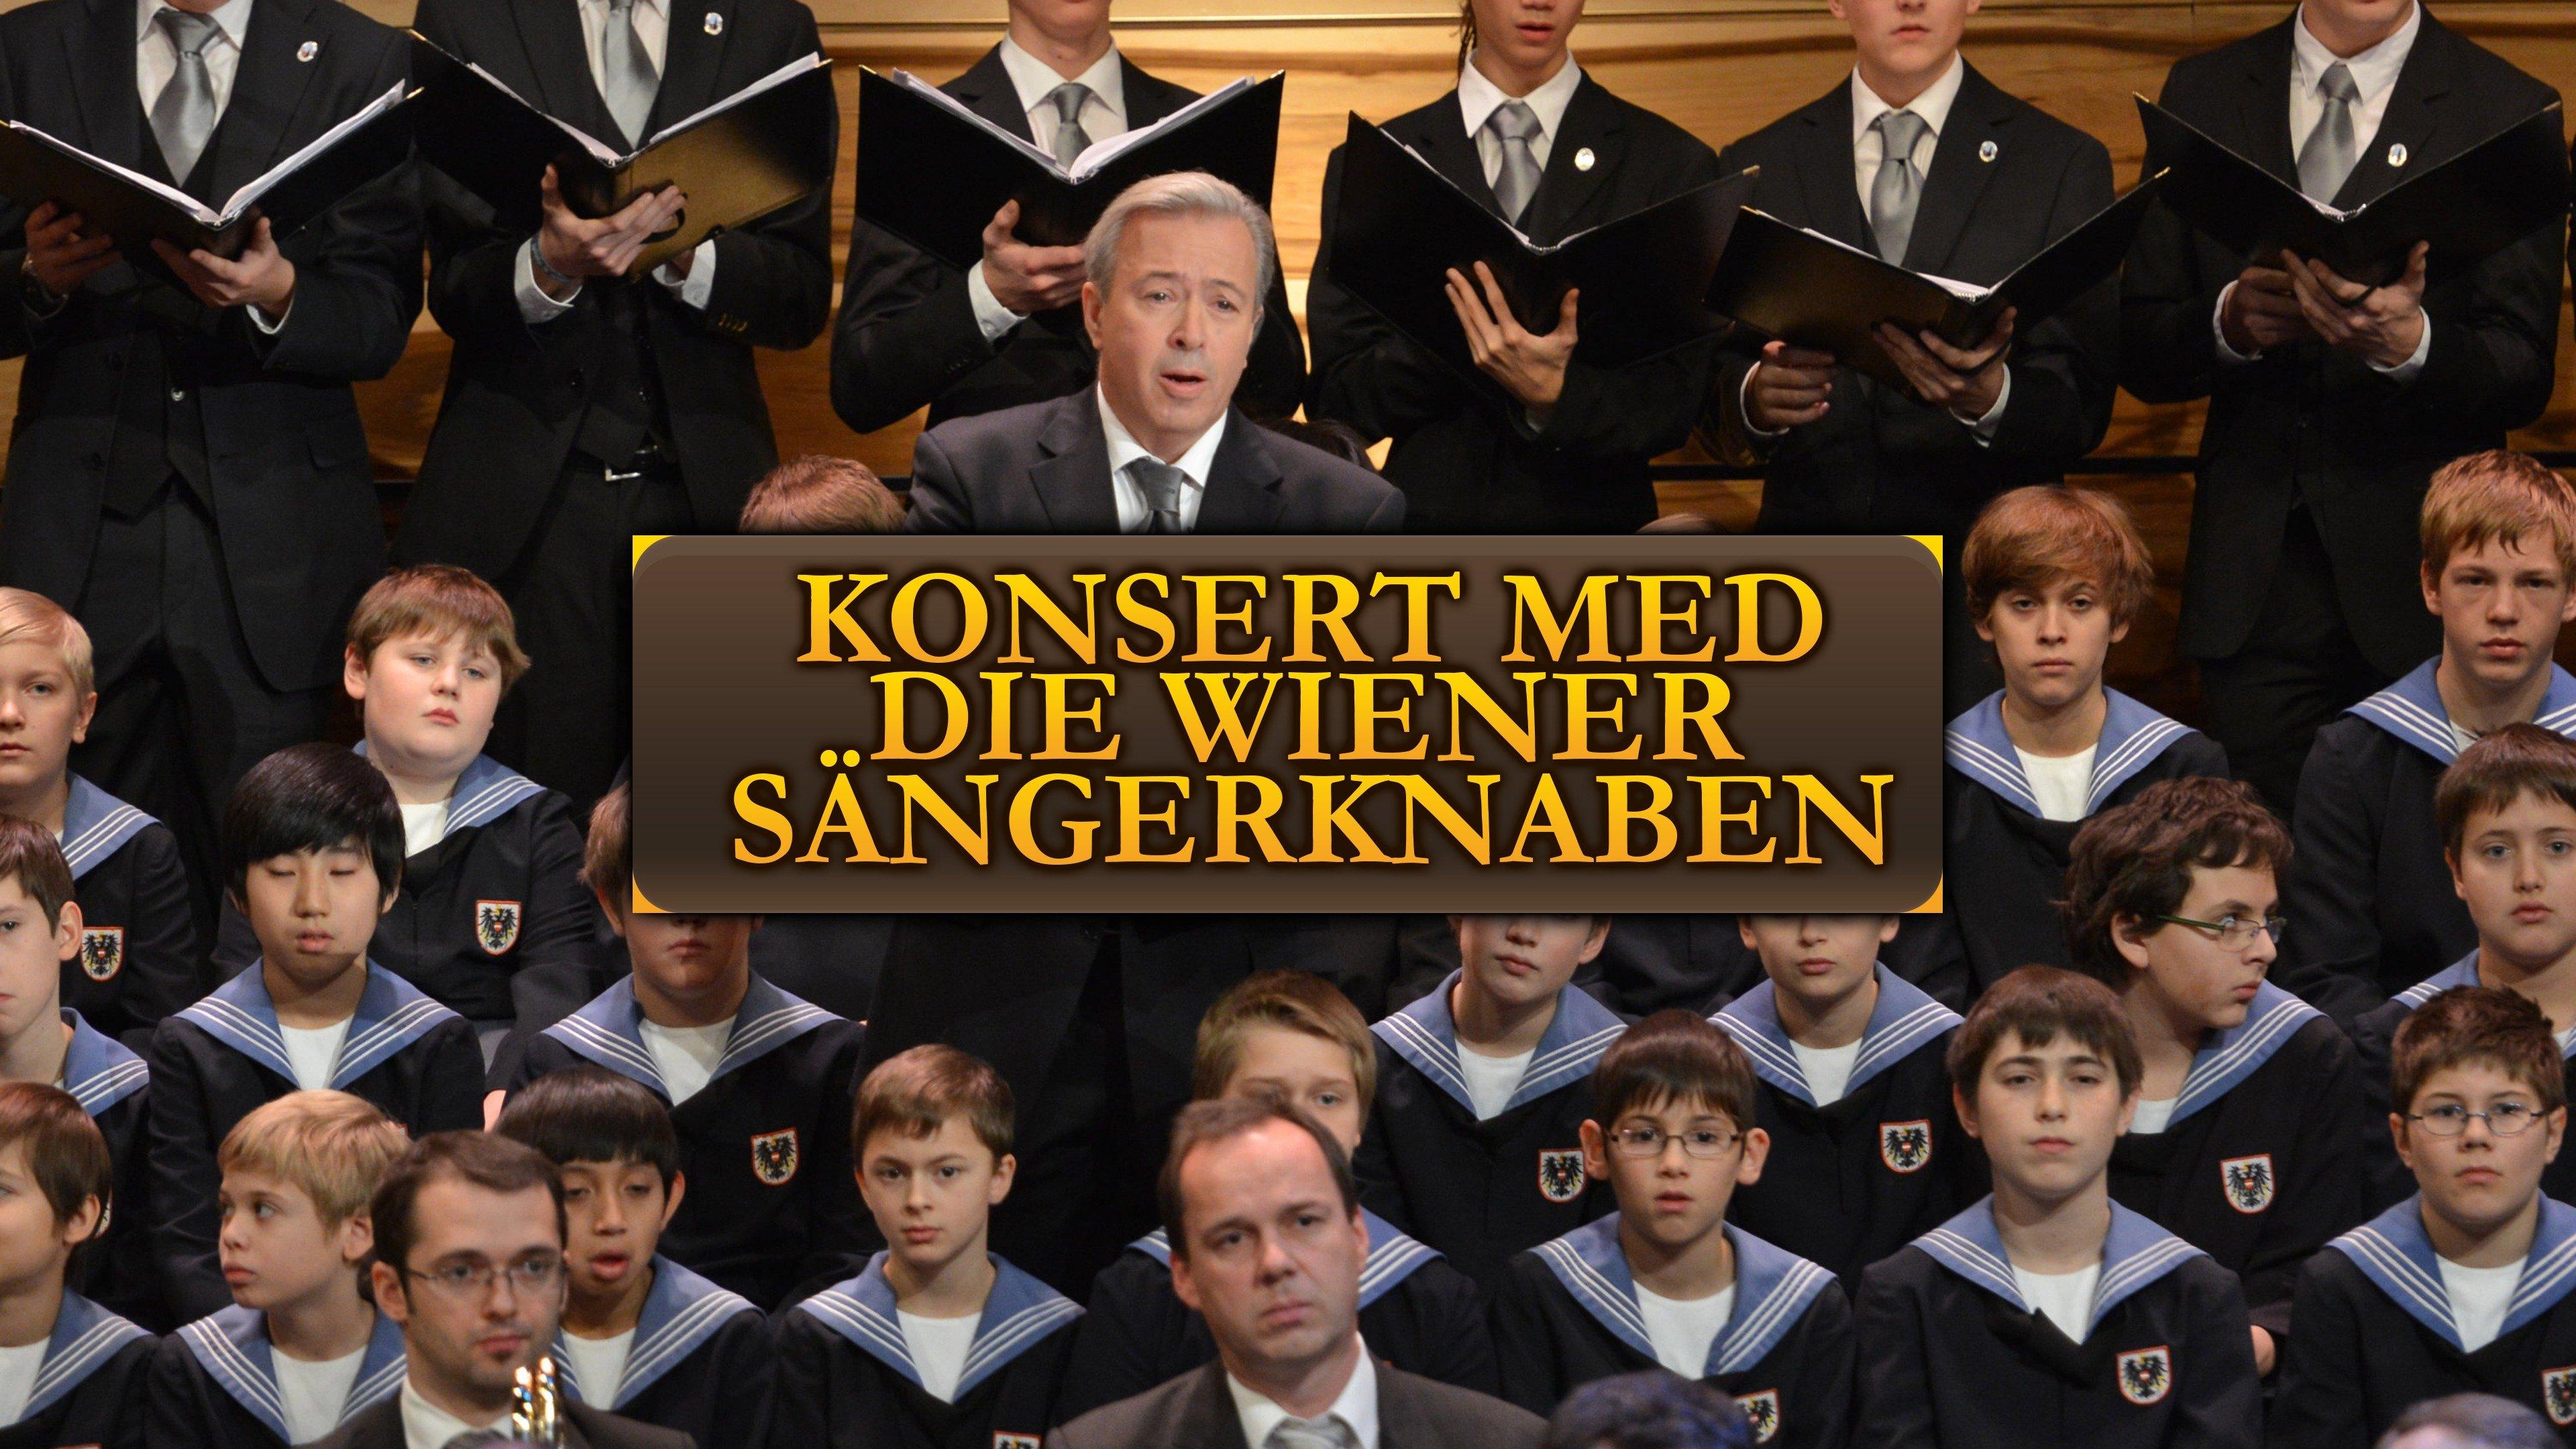 Konsert med Die Wiener Sängerknaben